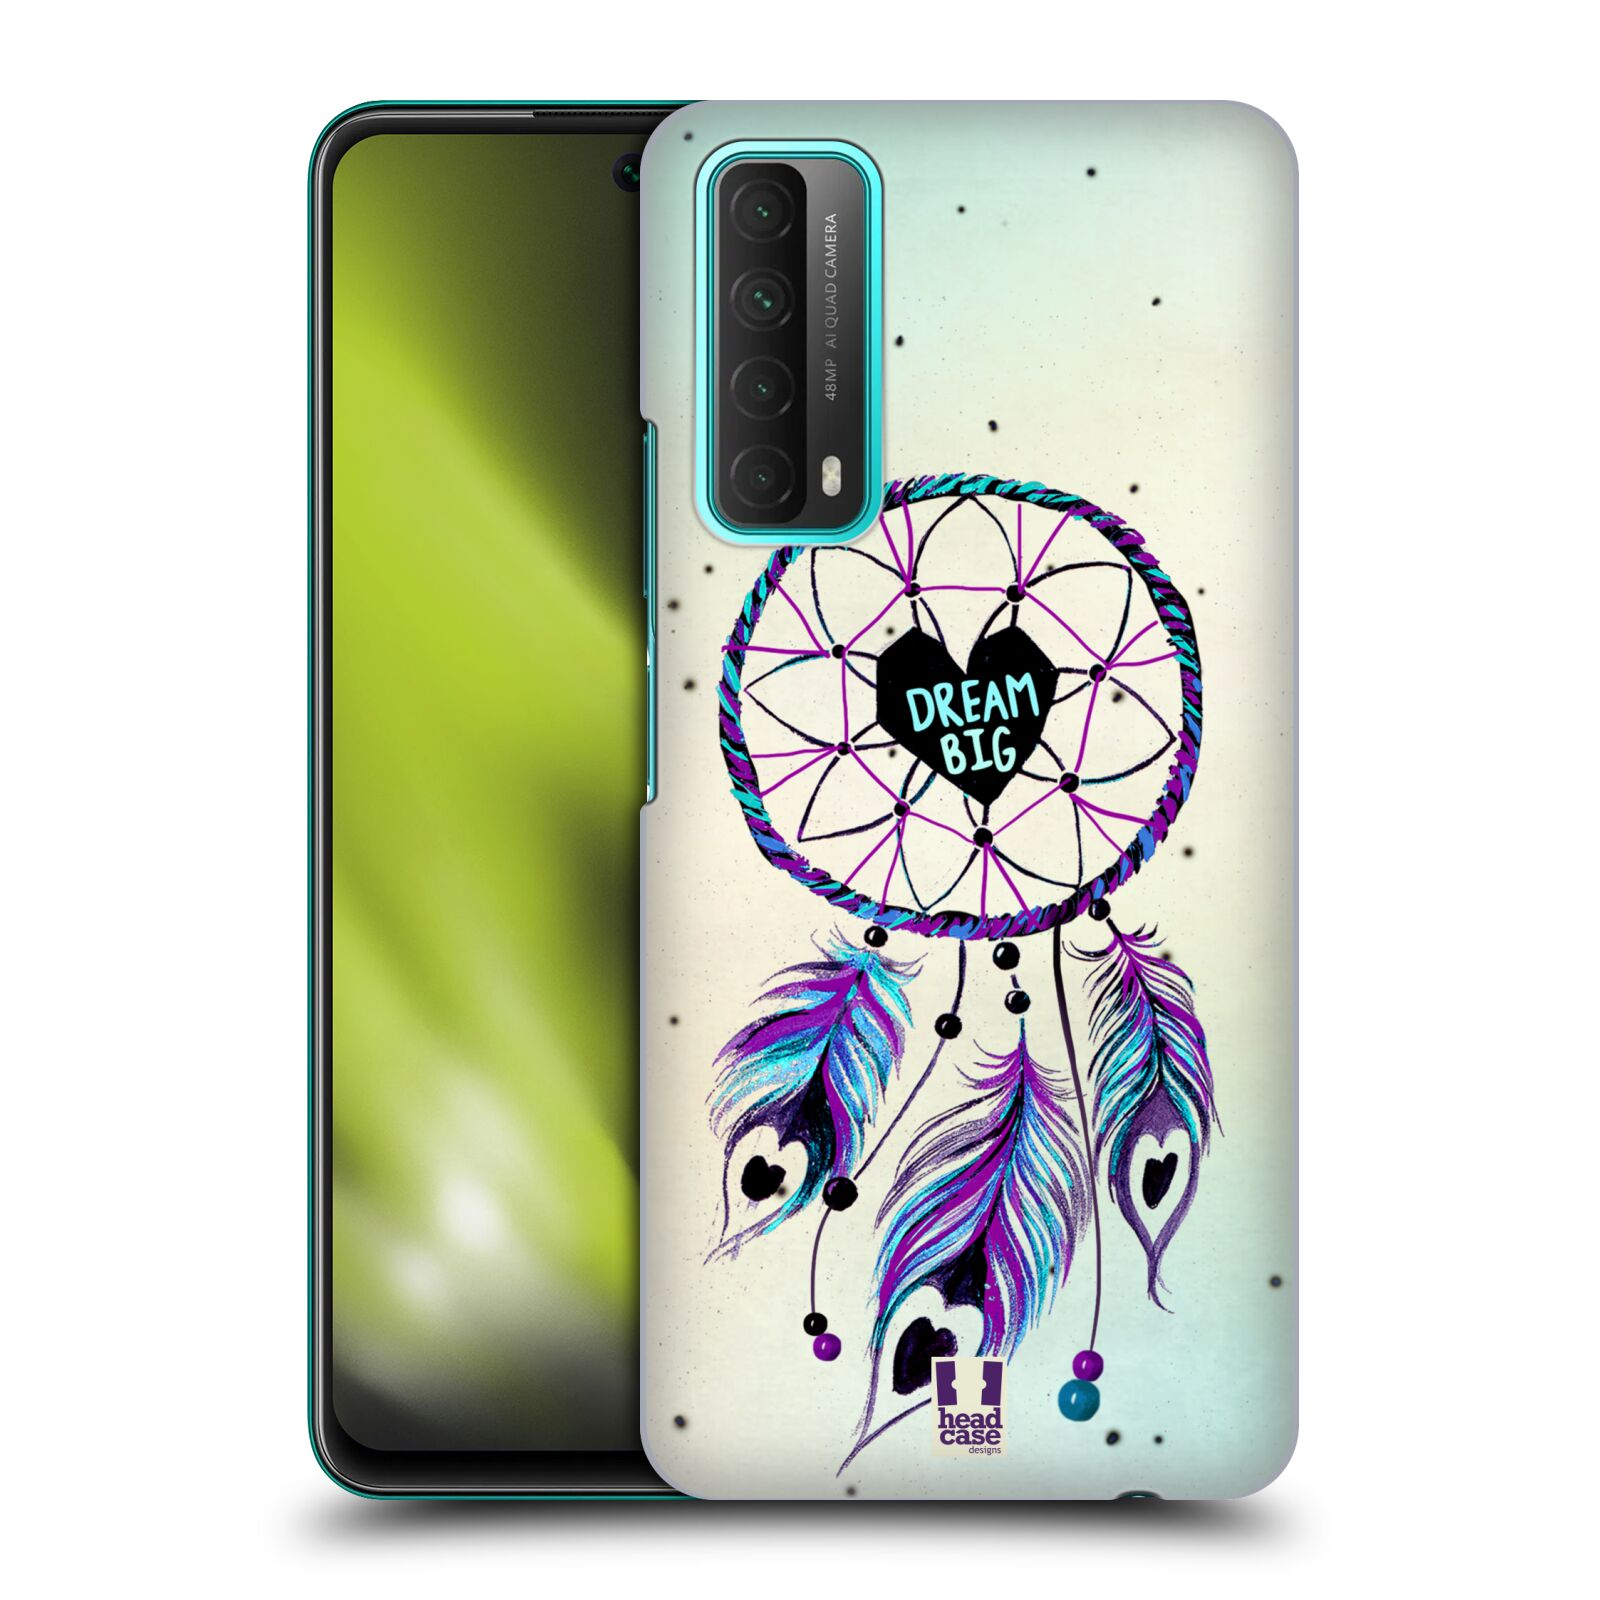 Plastové pouzdro na mobil Huawei P Smart (2021) - Head Case - Lapač Assorted Dream Big Srdce